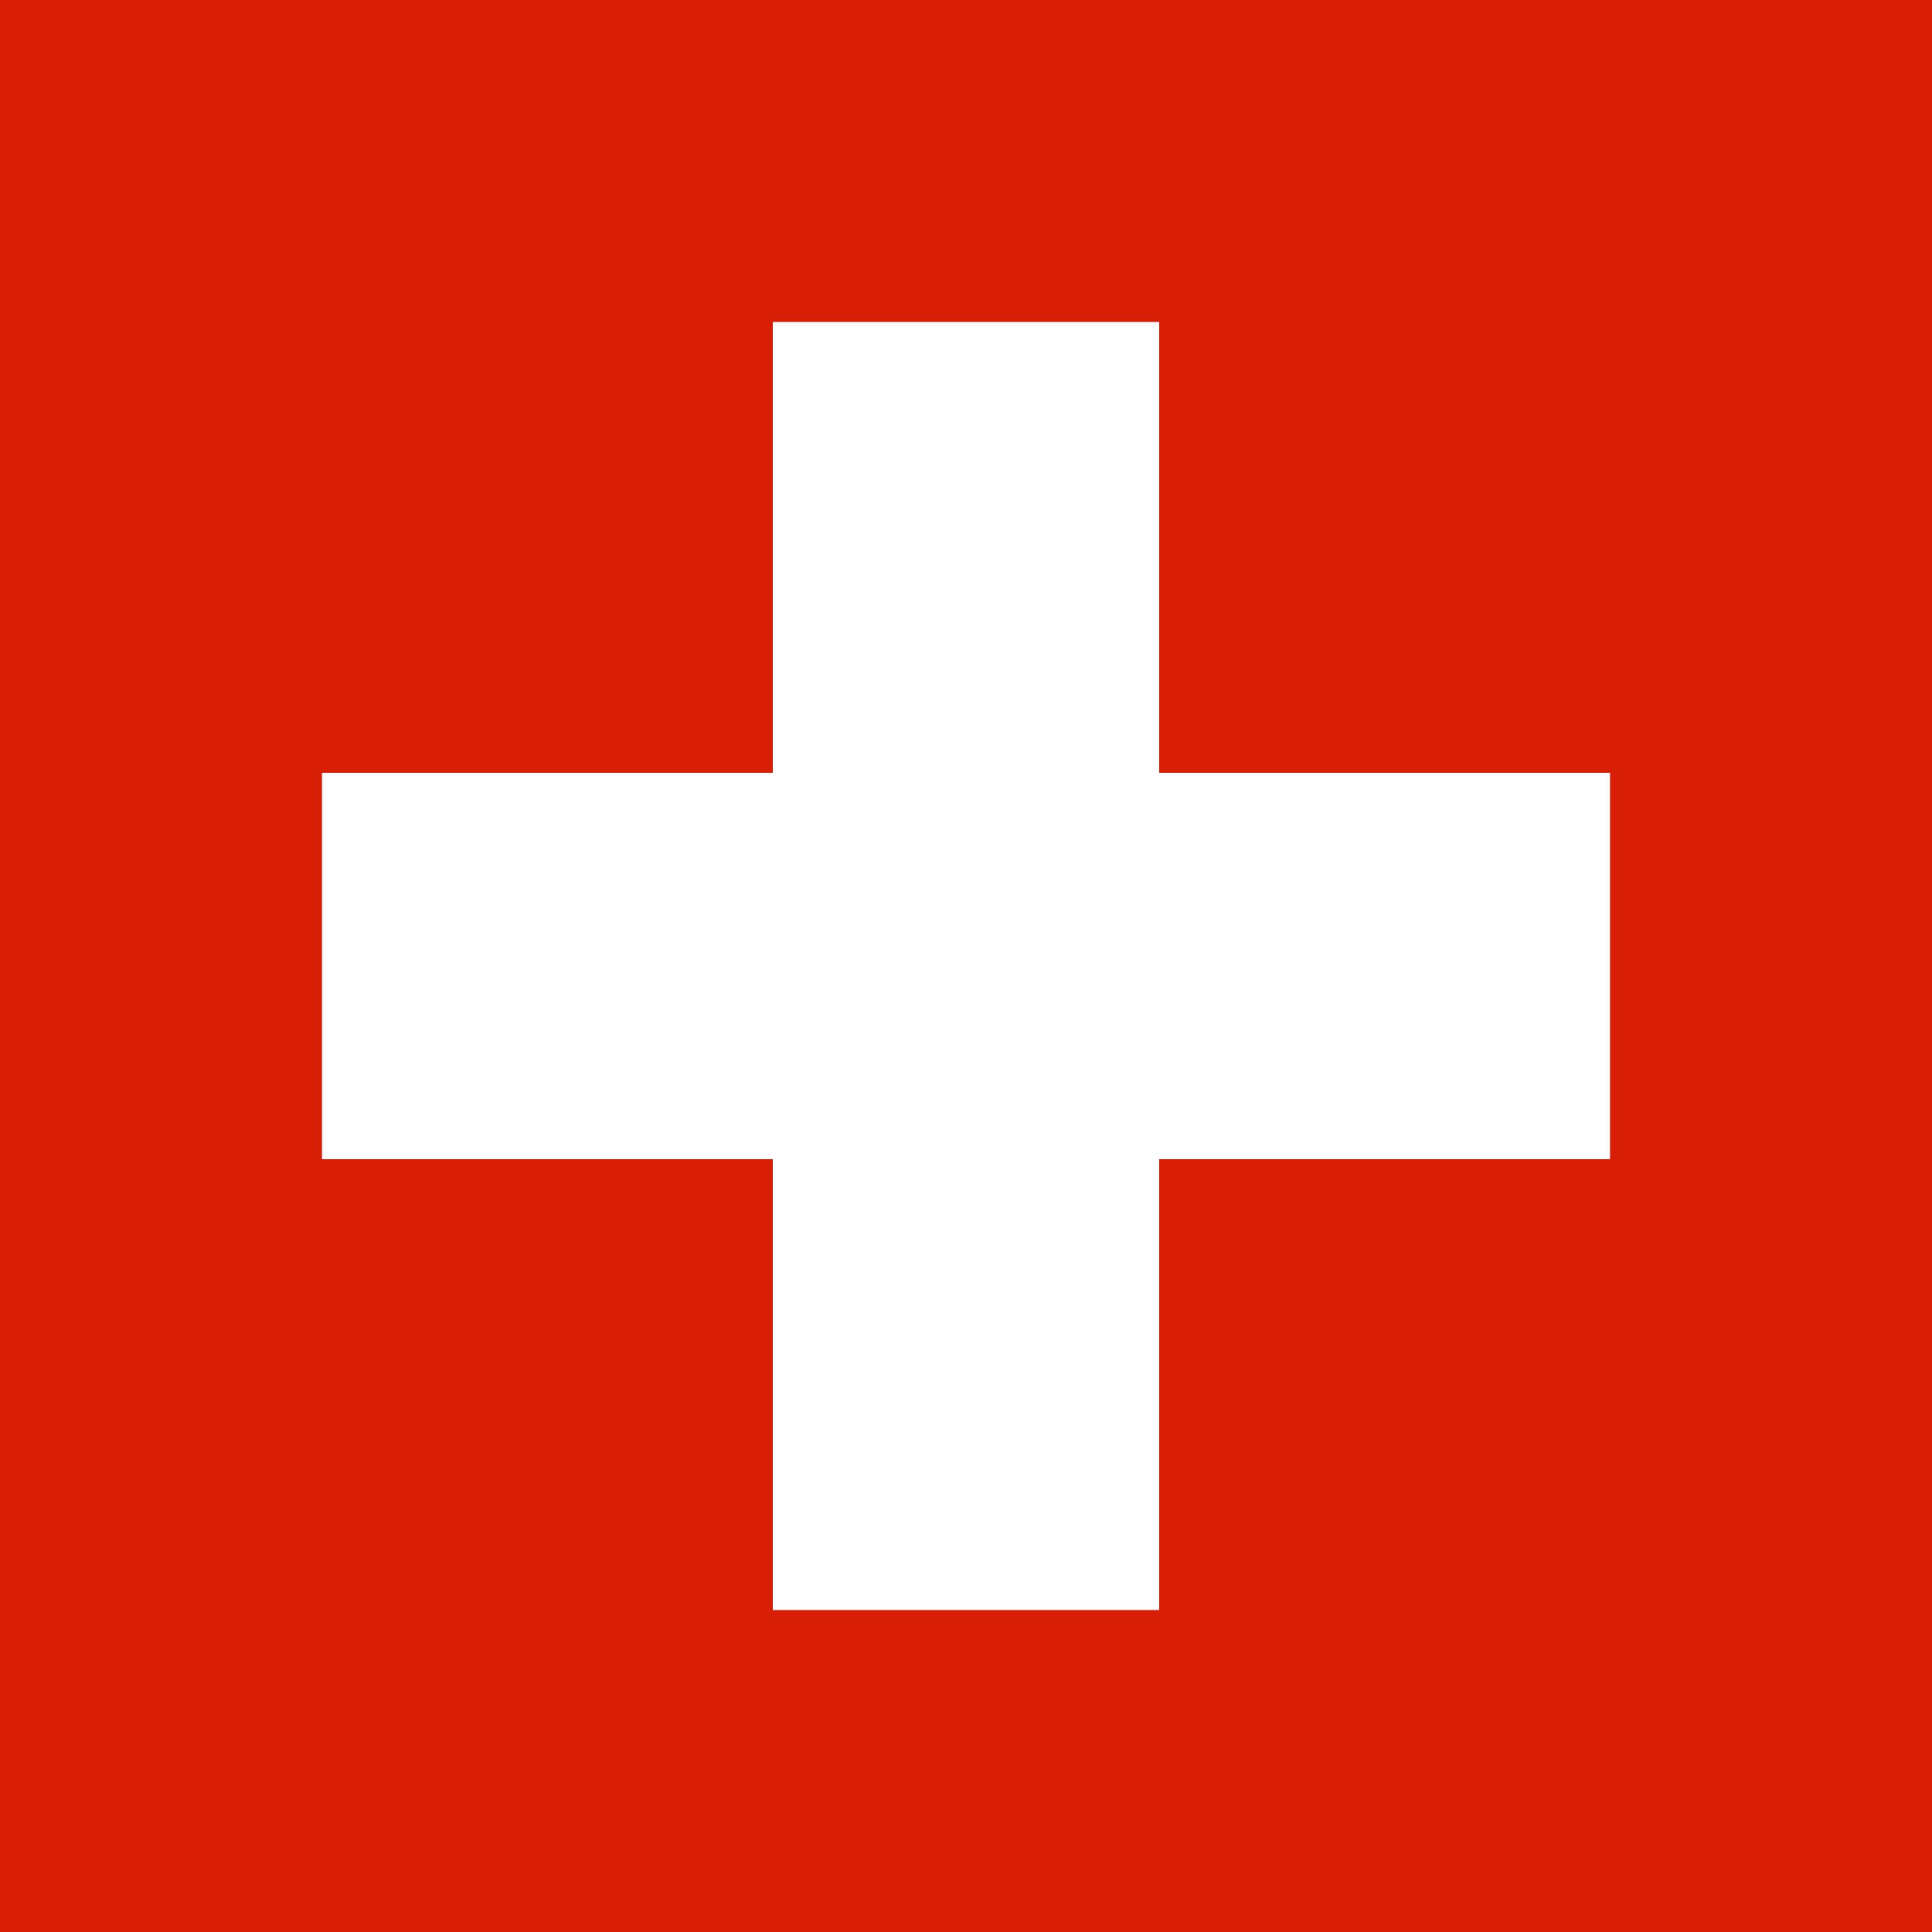 स्विट्ज़रलैंड, país, emblema, insignia, प्रतीक - HD वॉलपेपर - प्रोफेसर-falken.com